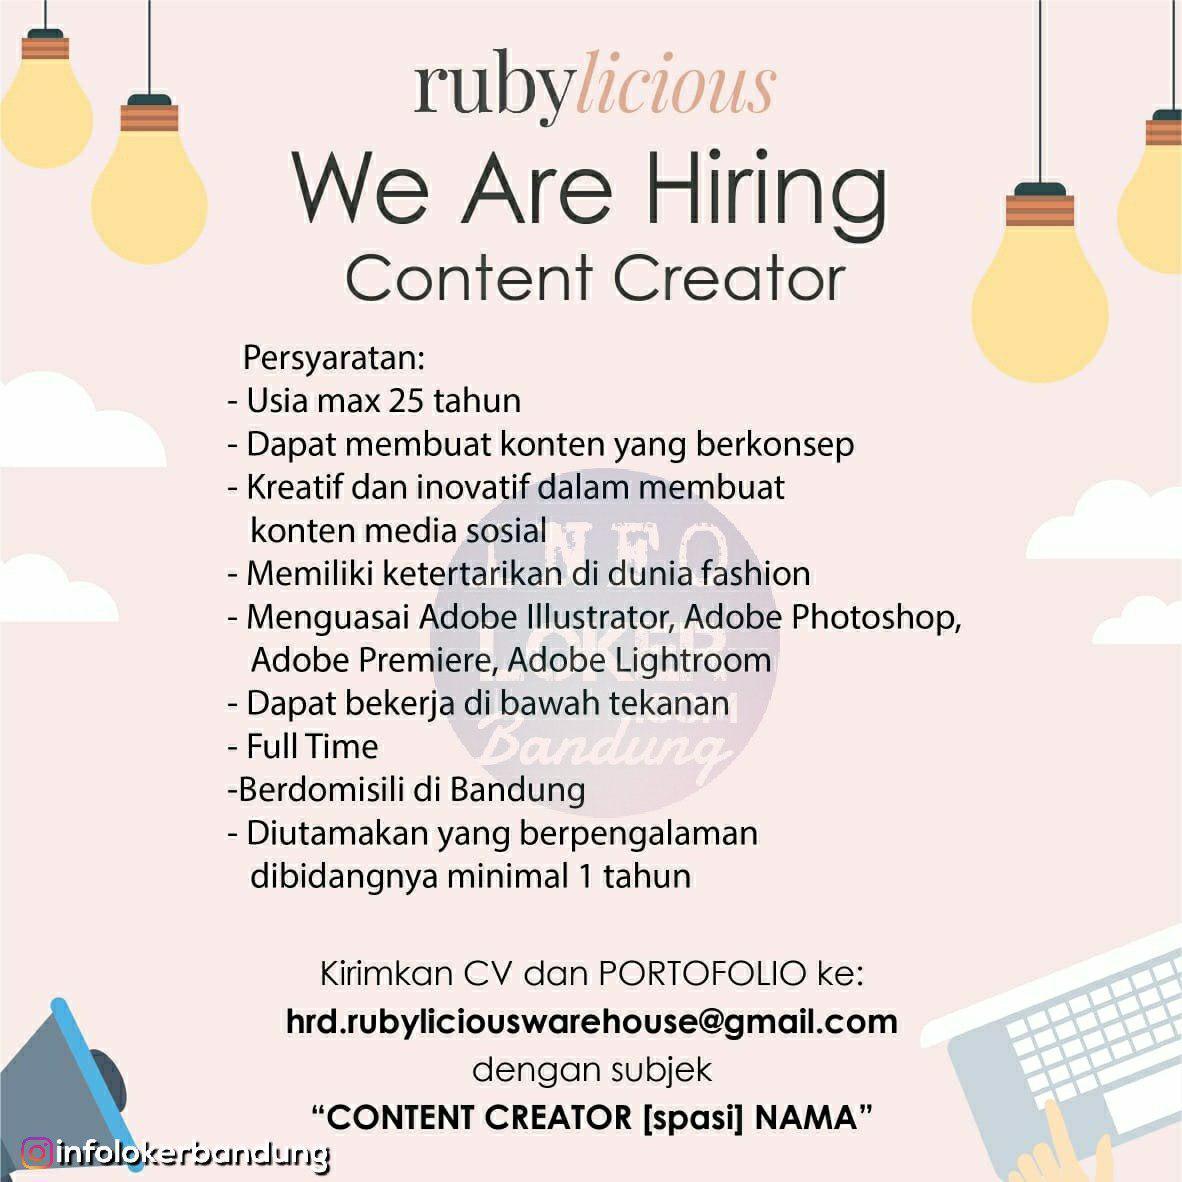 Lowongan Kerja Rubylicious Bandung Agustus 2018